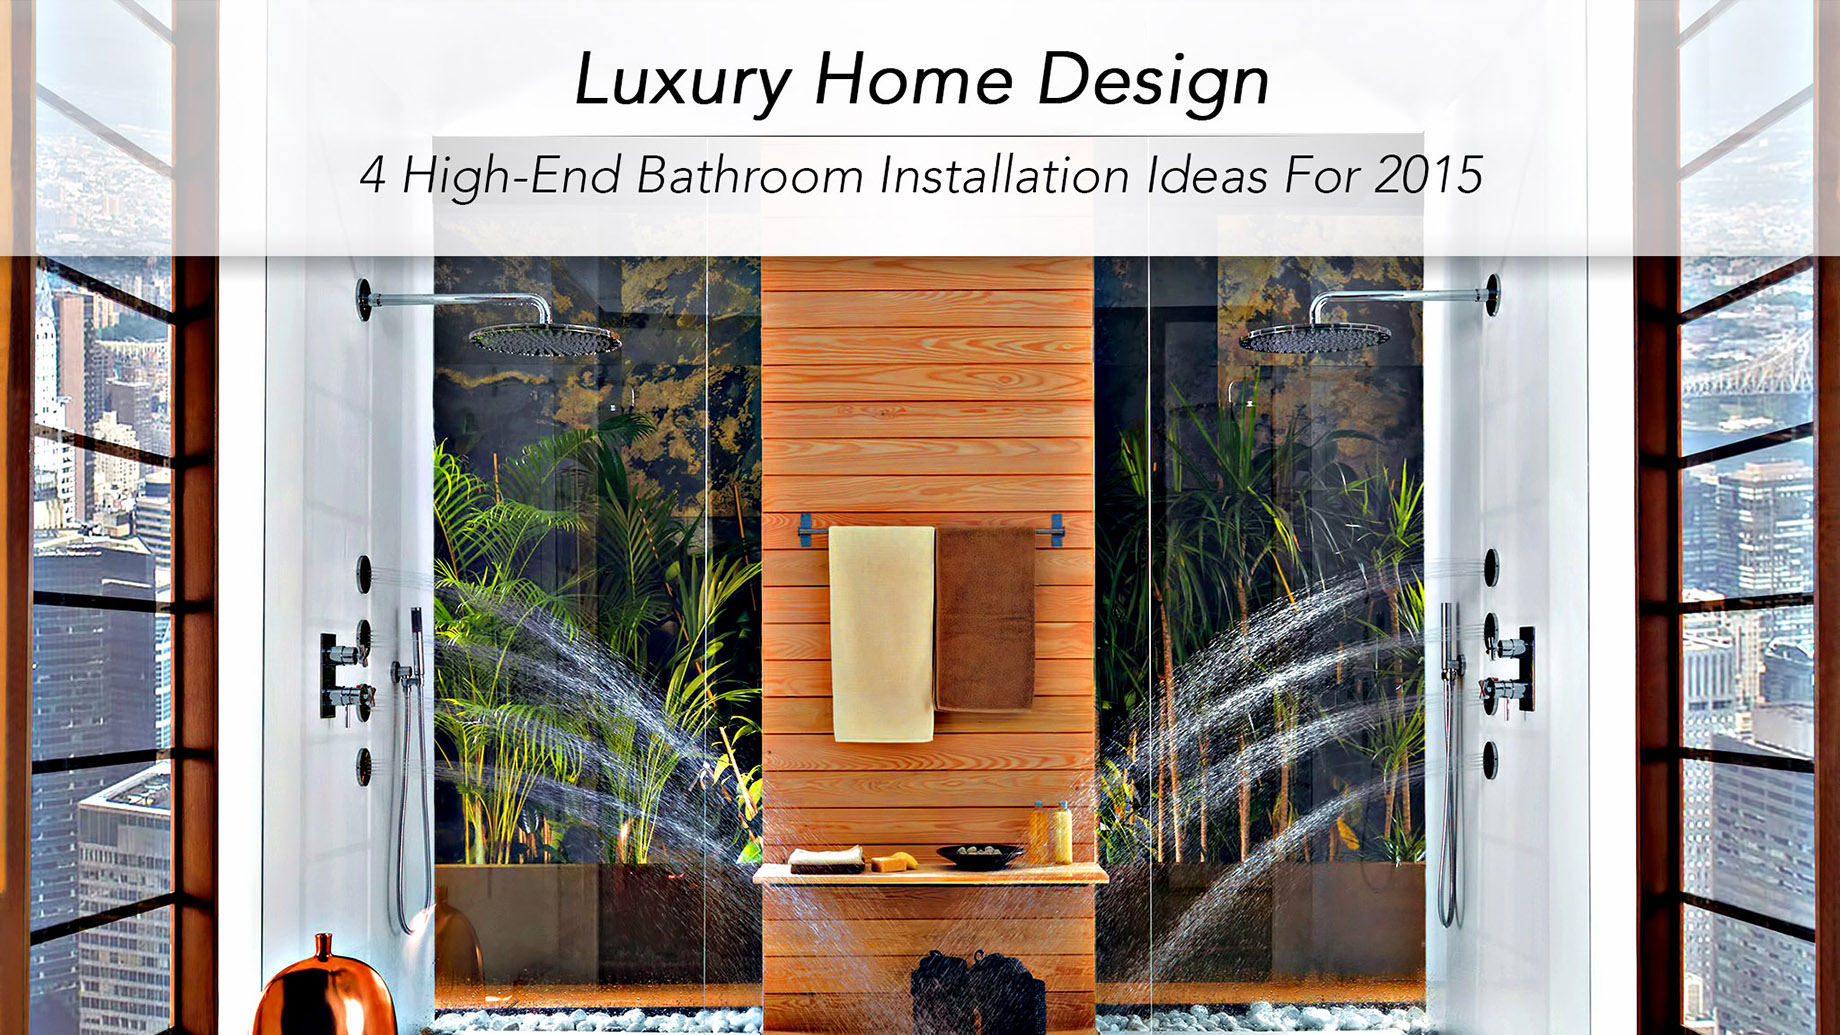 Luxury Home Design 4 High End Bathroom Installation Ideas The Pinnacle List